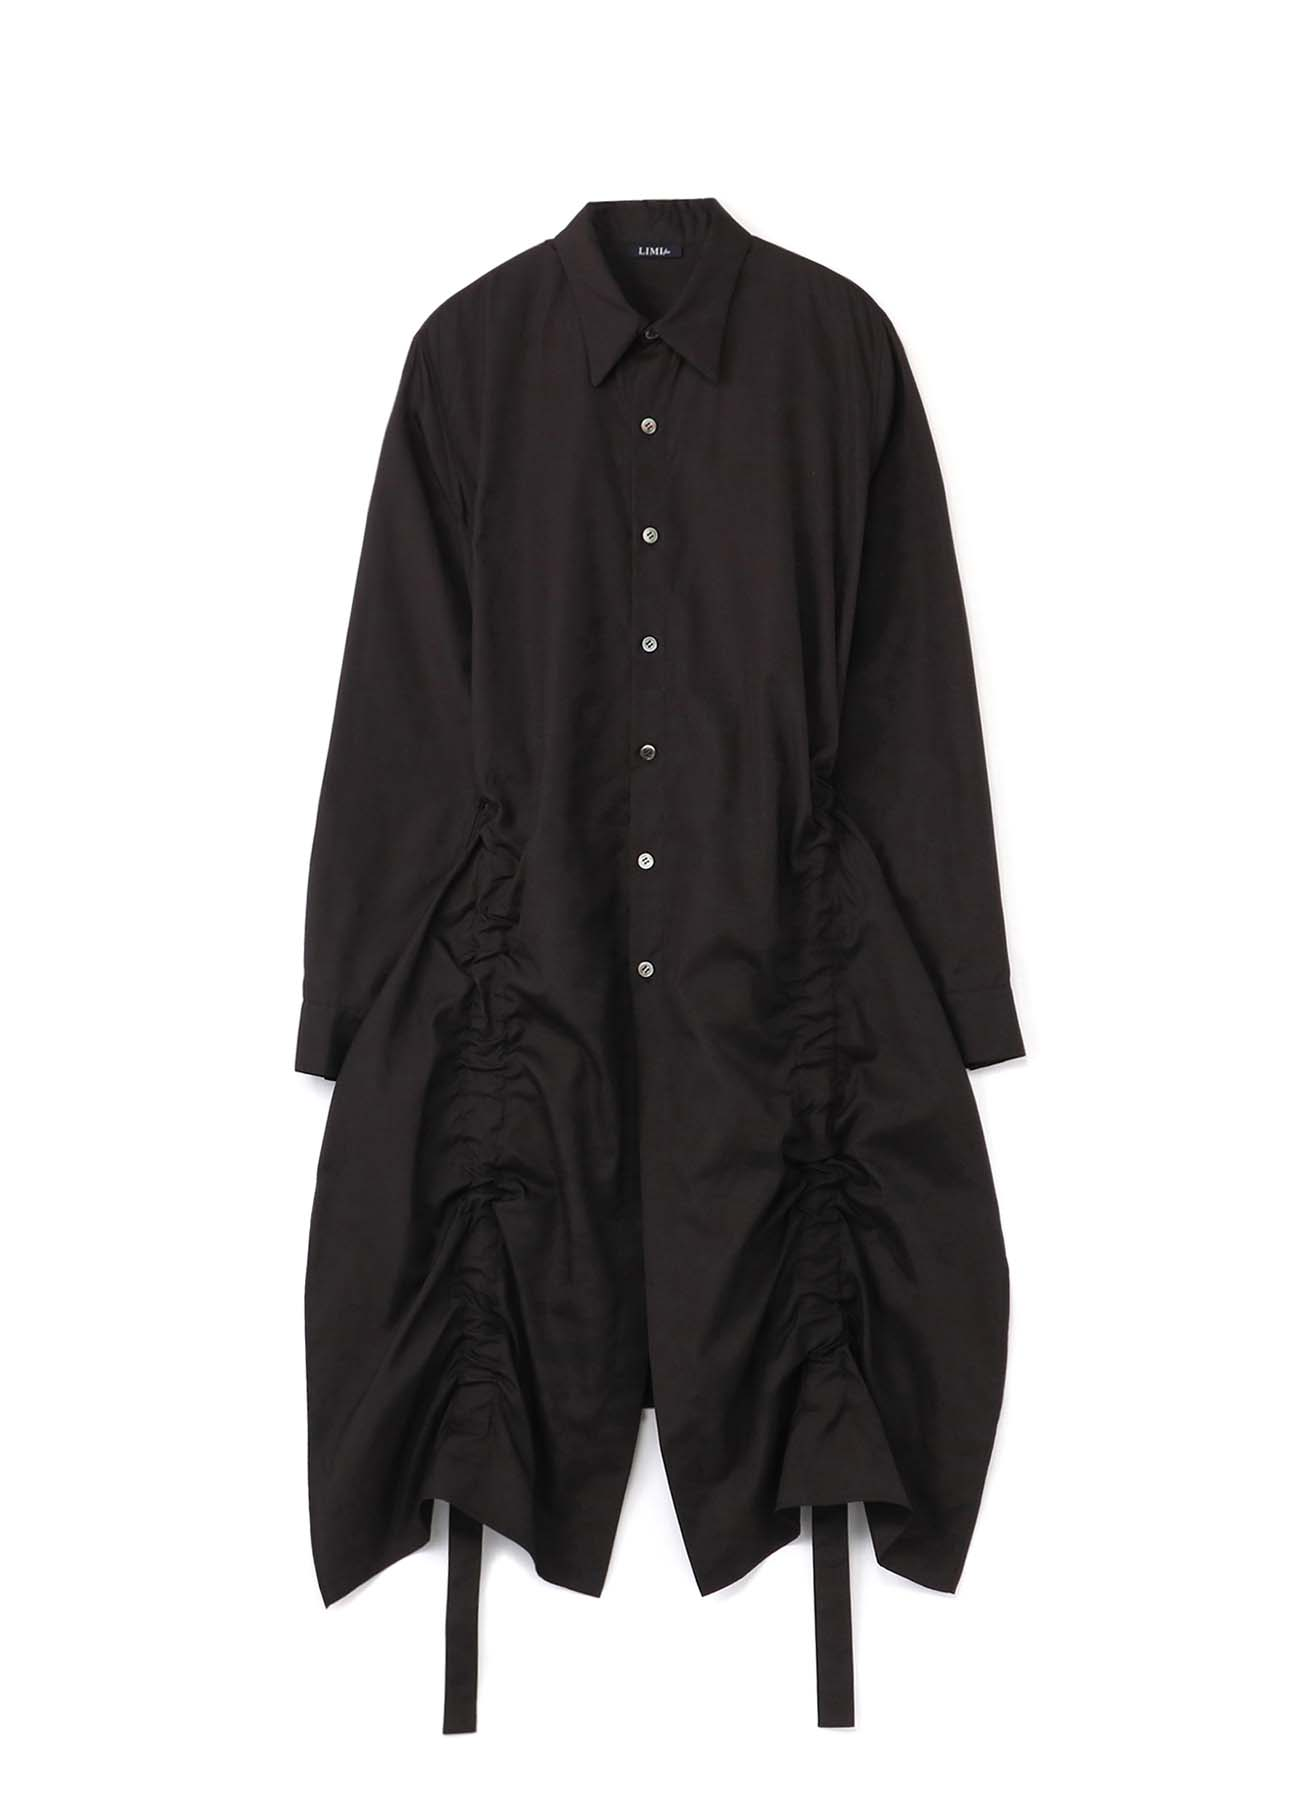 100/2 Broad B Shirring Shirt